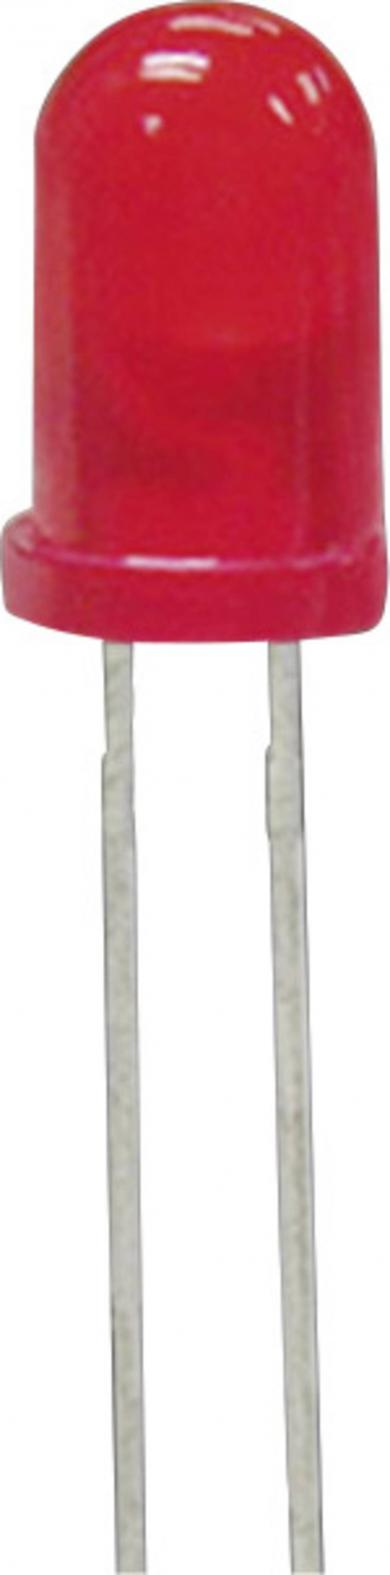 Led super luminos 5 mm, L 53 SRC/D, roșu, 35º, tipul carcasei 5 mm, 2000 mcd